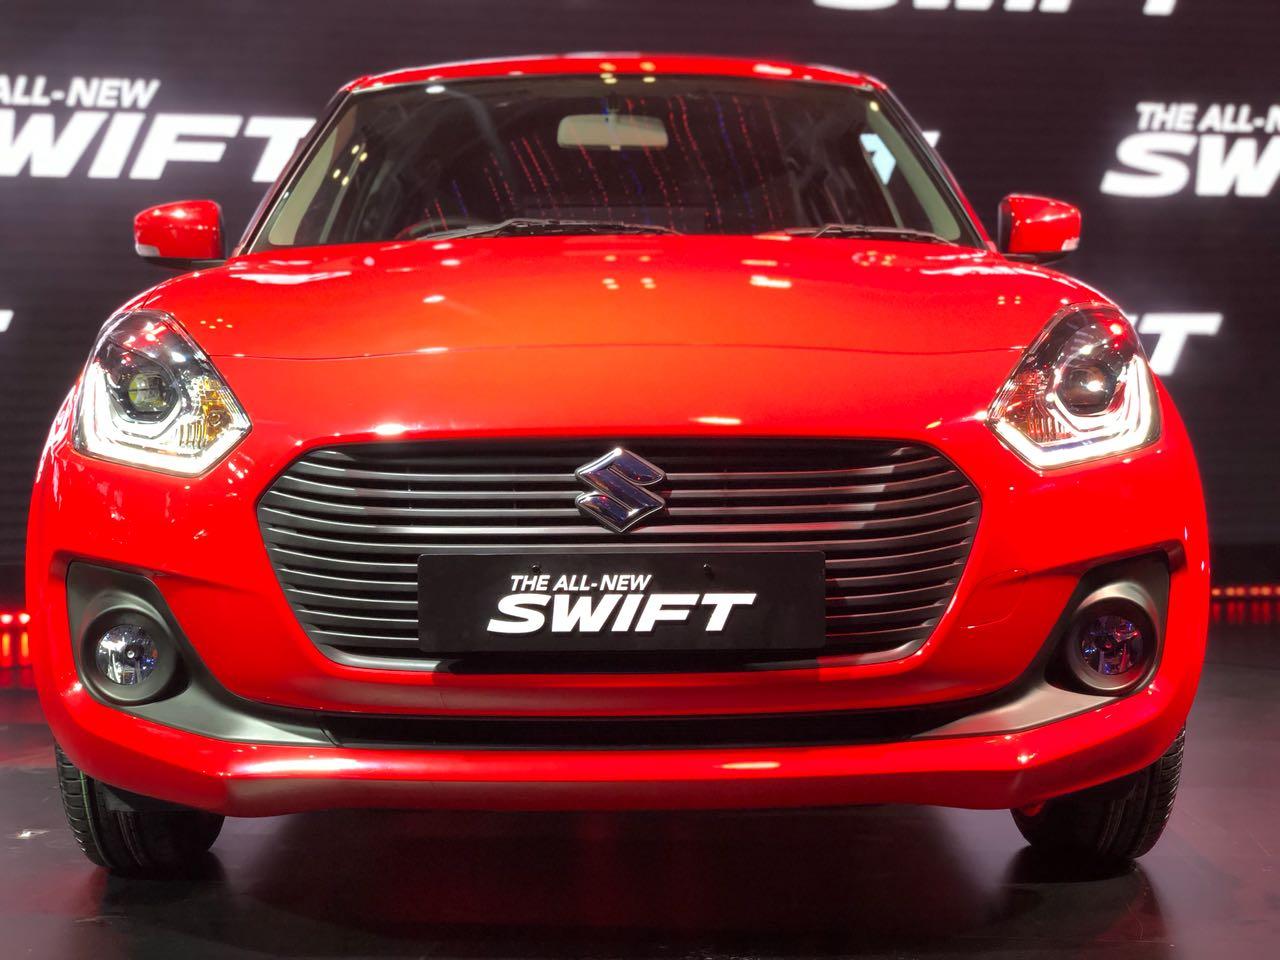 All New Maruti Suzuki Swift Launched Starting Price Rs 4 99 Lakh